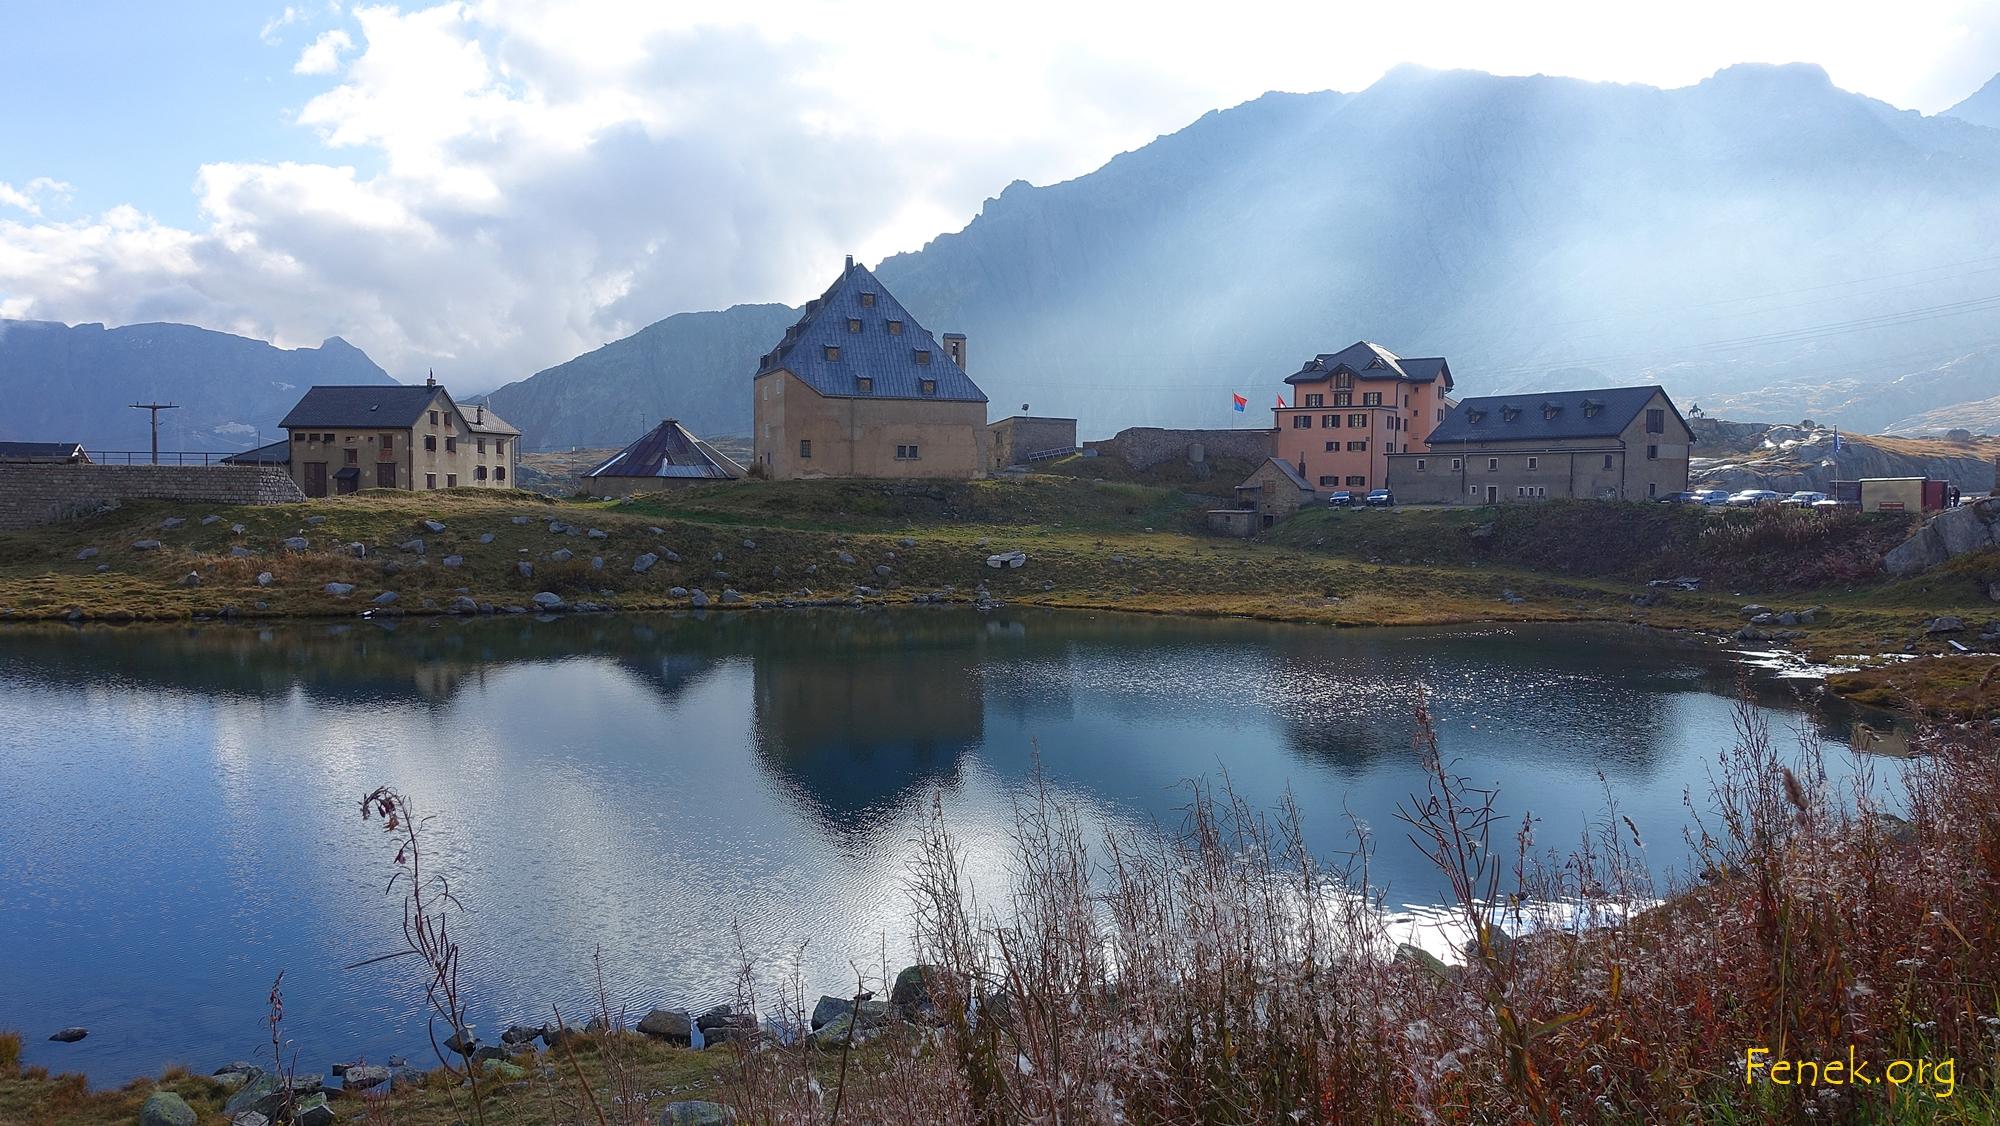 zurück beim Gotthardpass